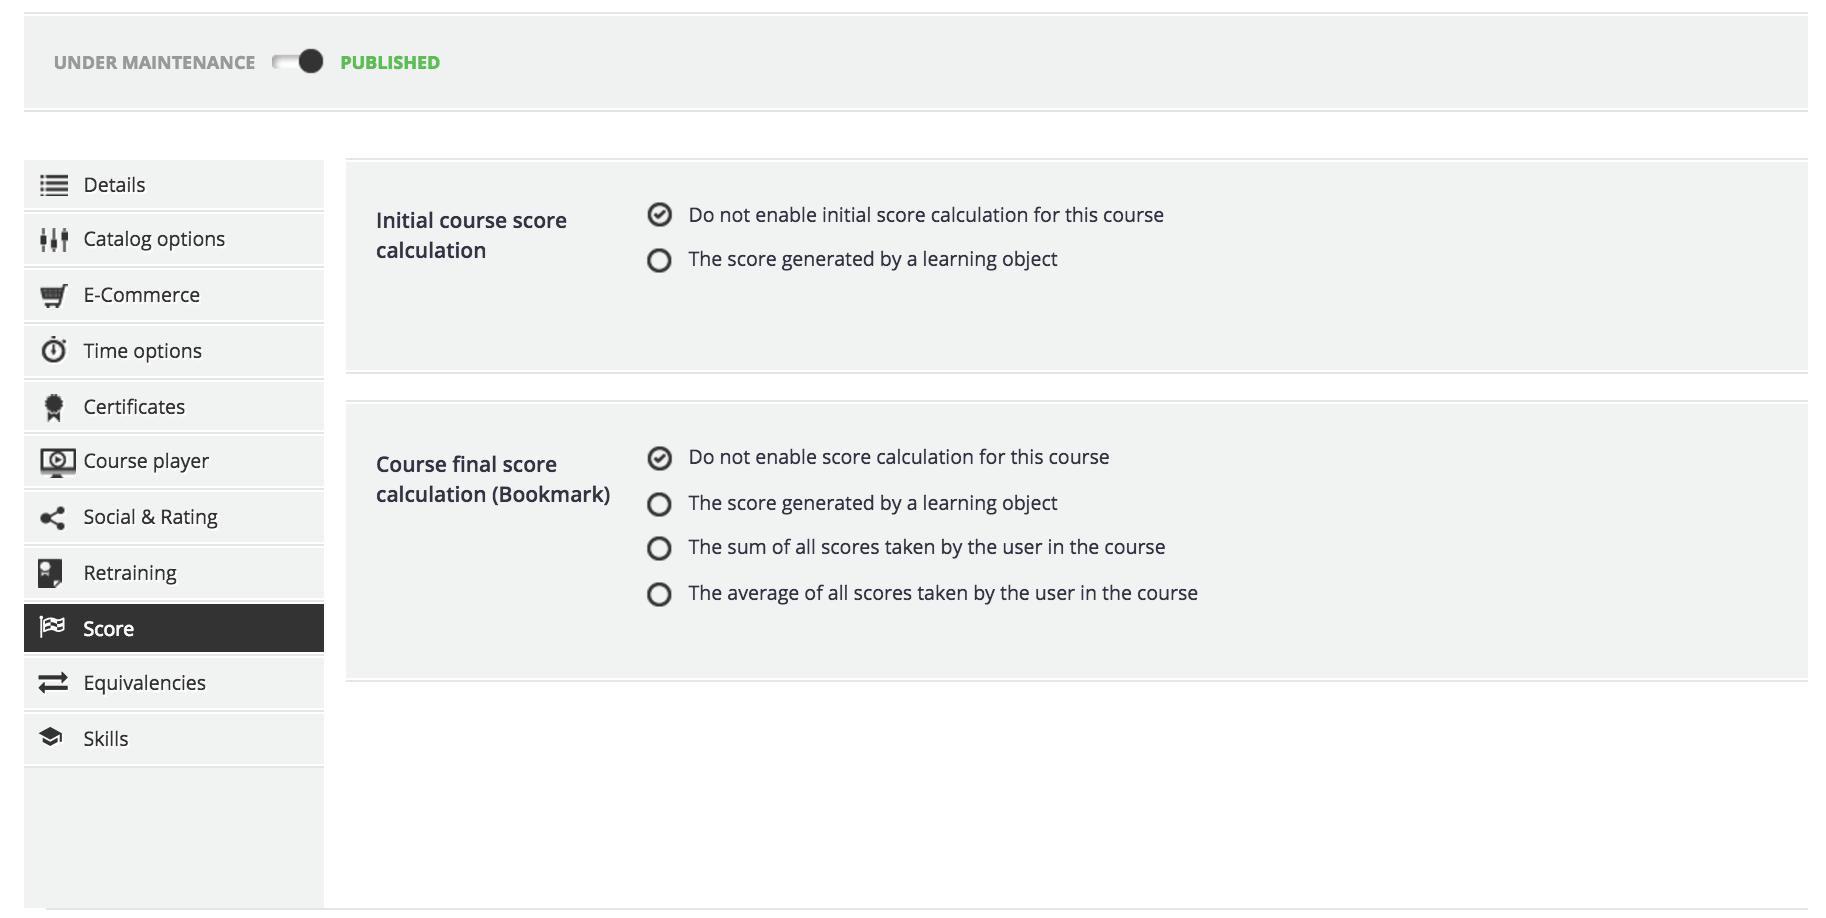 course advanced options score